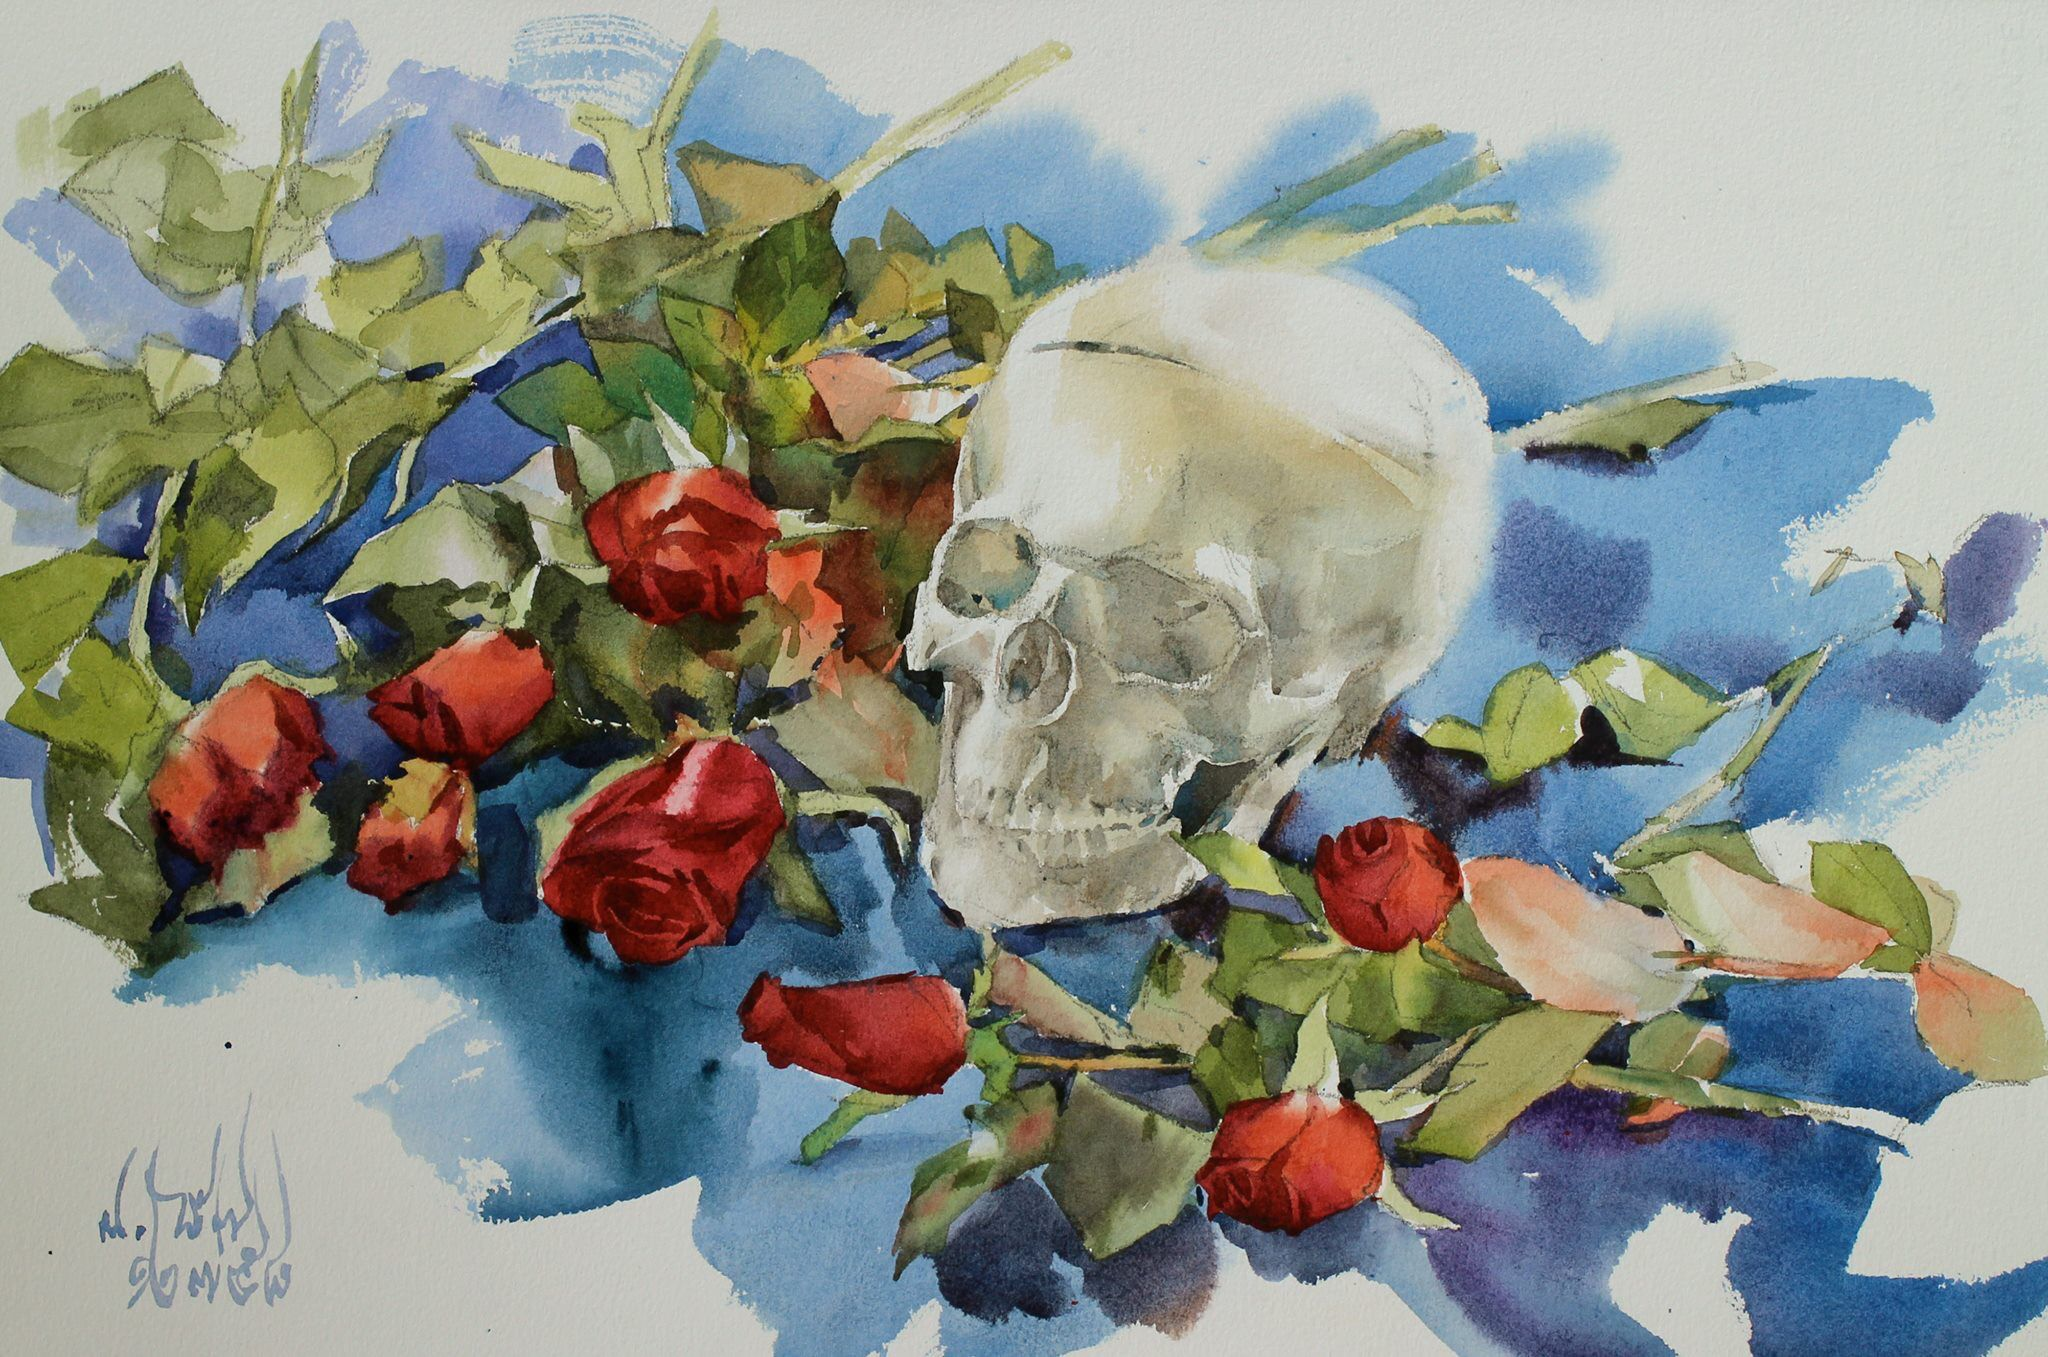 Watana Kreetong Roses and Skull /2015 38x56cm